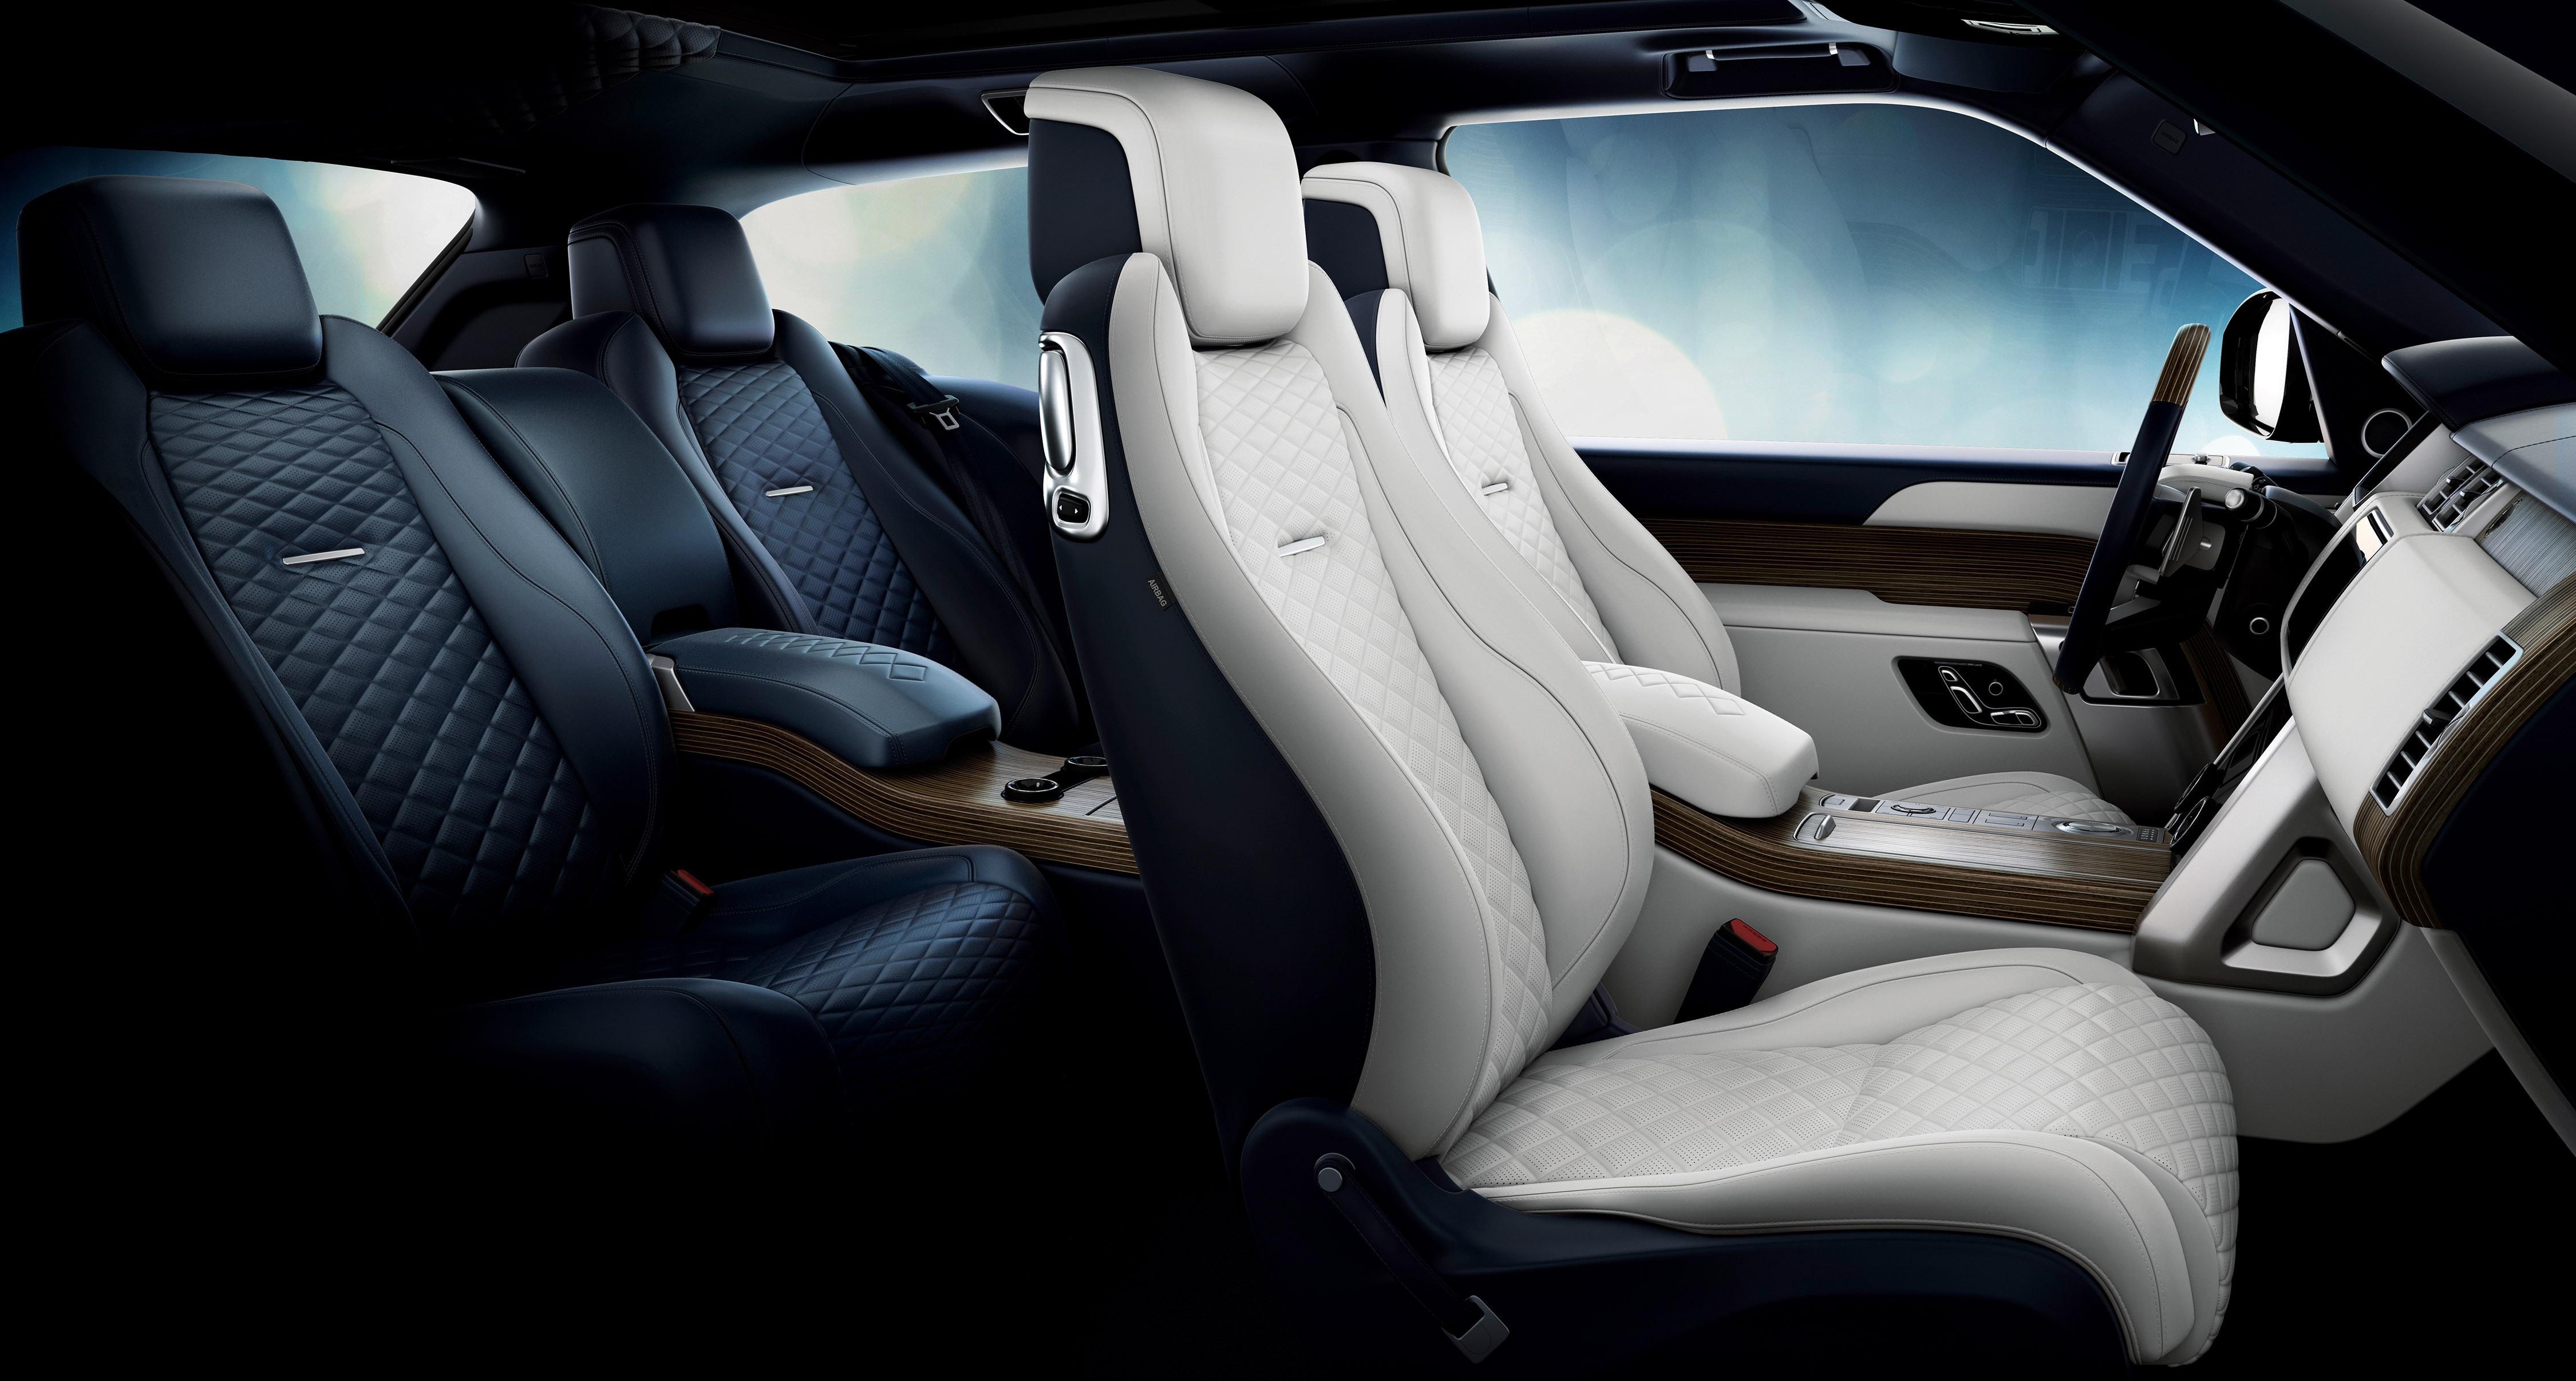 273748 11 range rover sv coupe efc02f original 1519909260